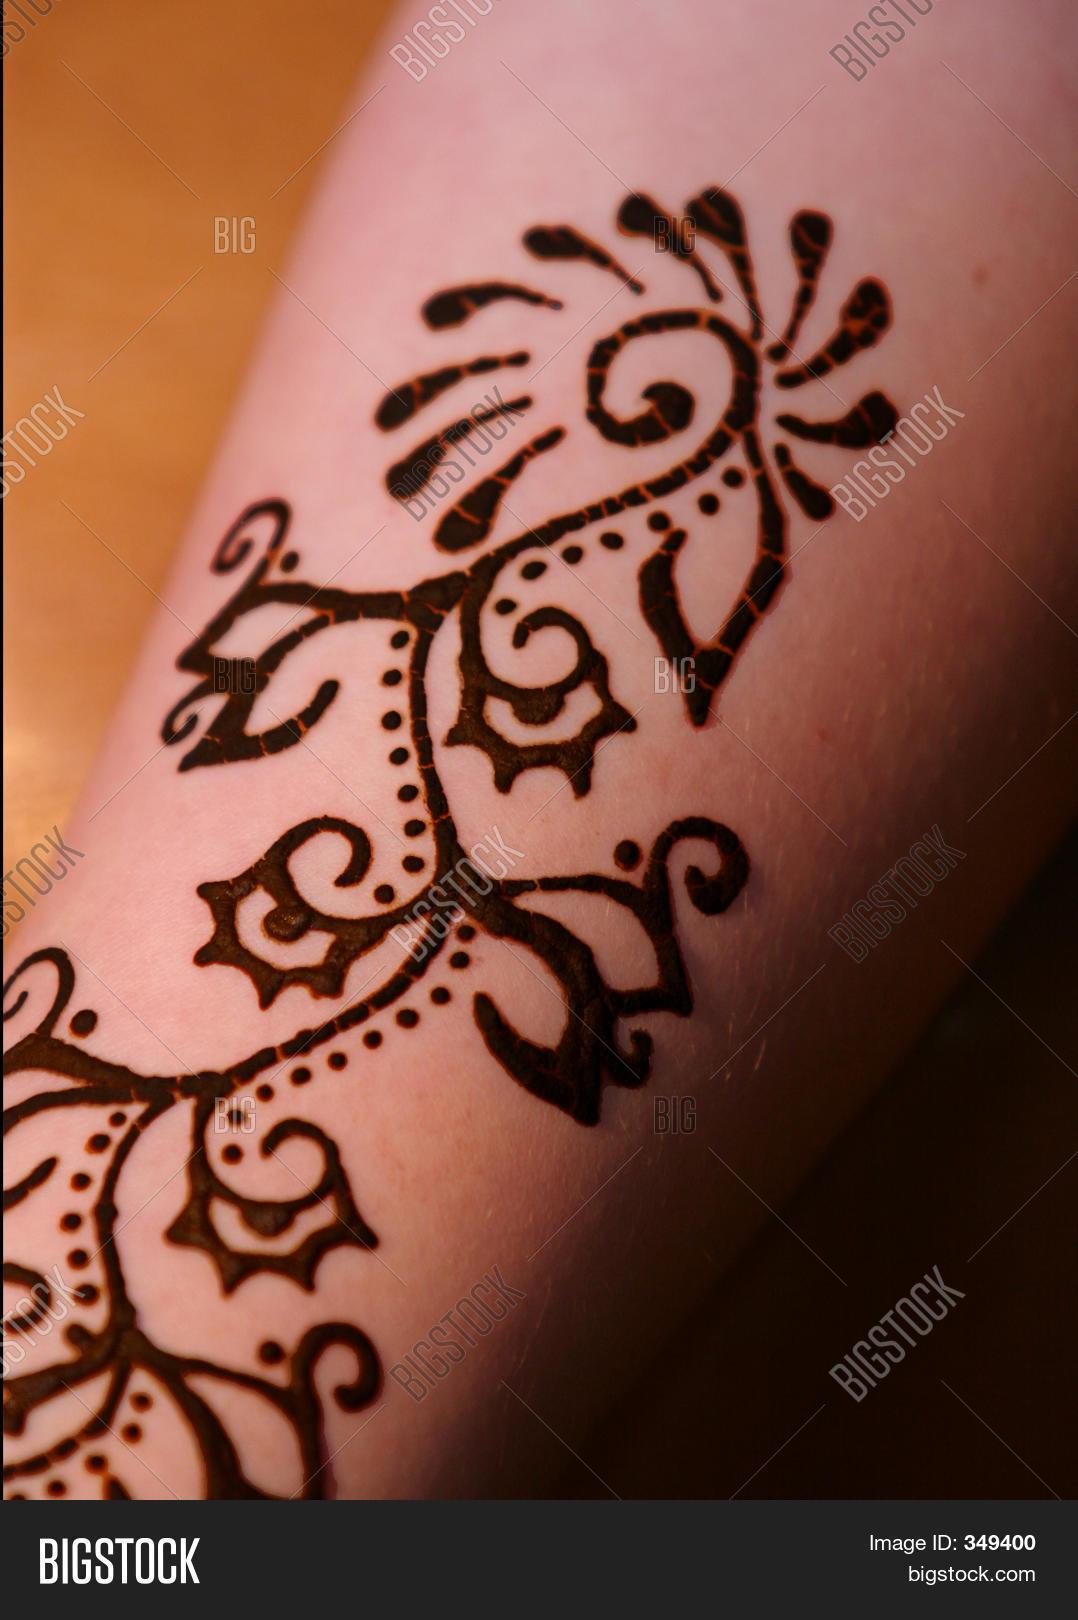 Henna Tattoo On Image Photo Free Trial Bigstock